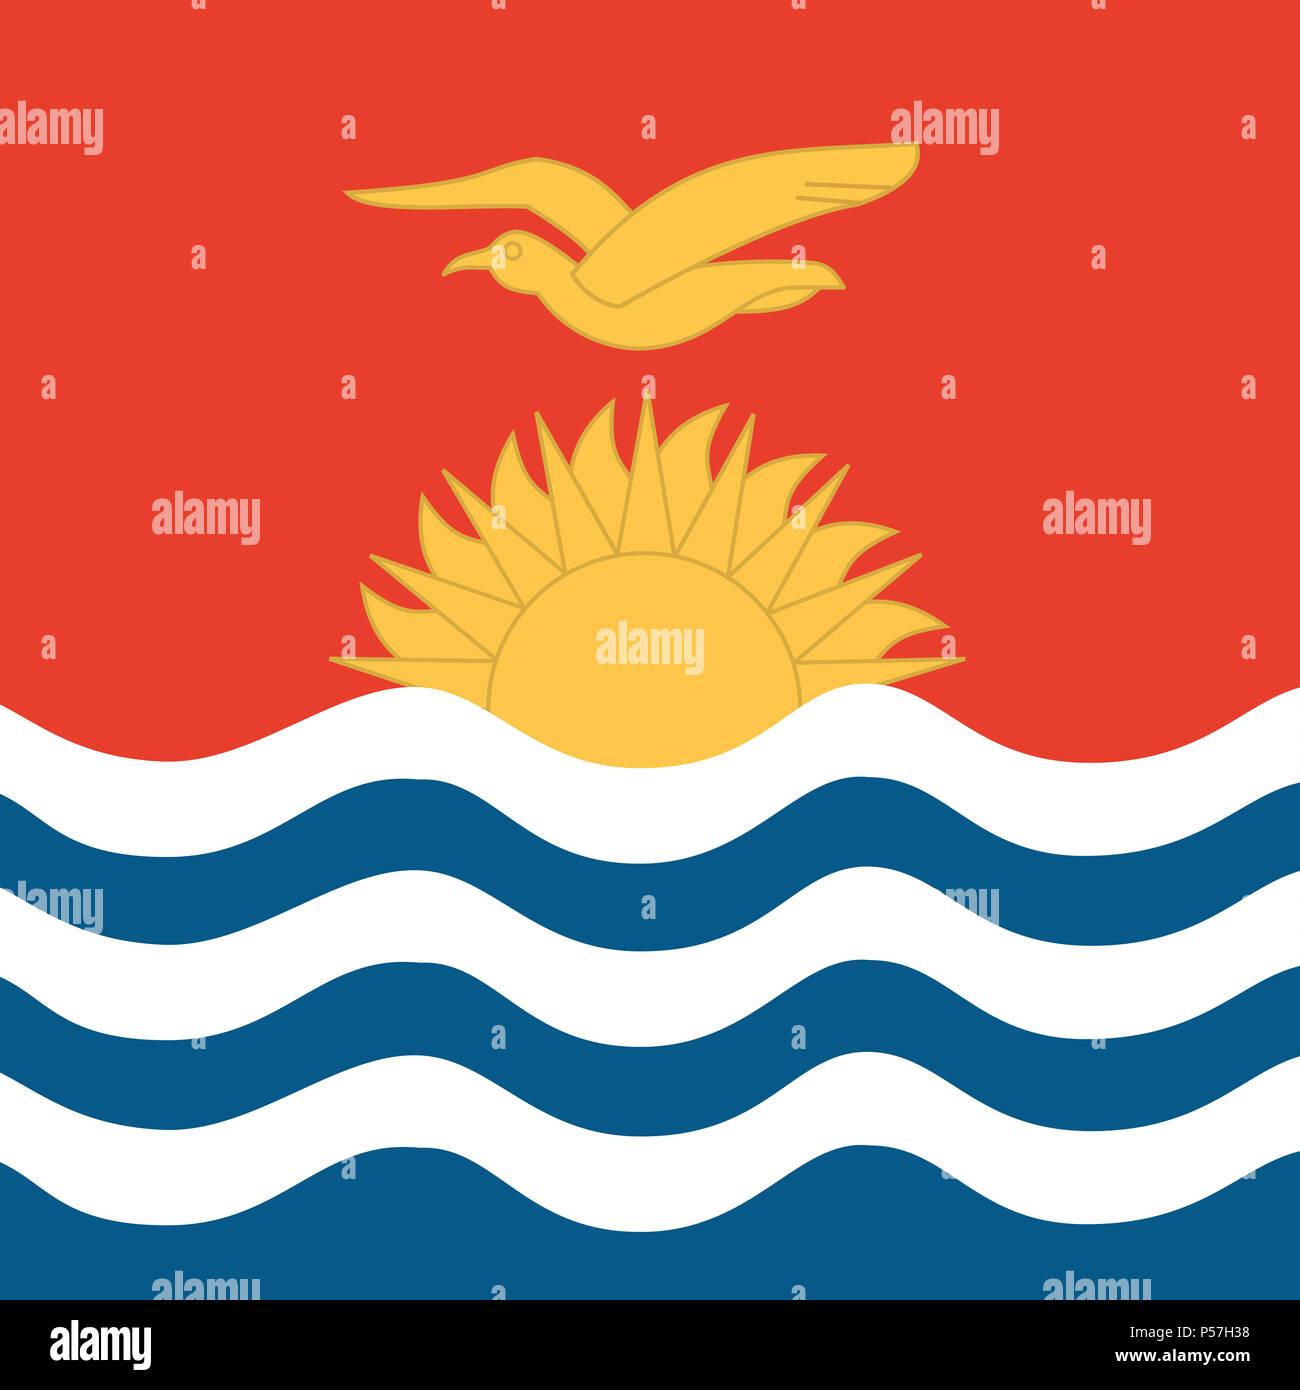 Official national flag of Kiribati - Stock Image